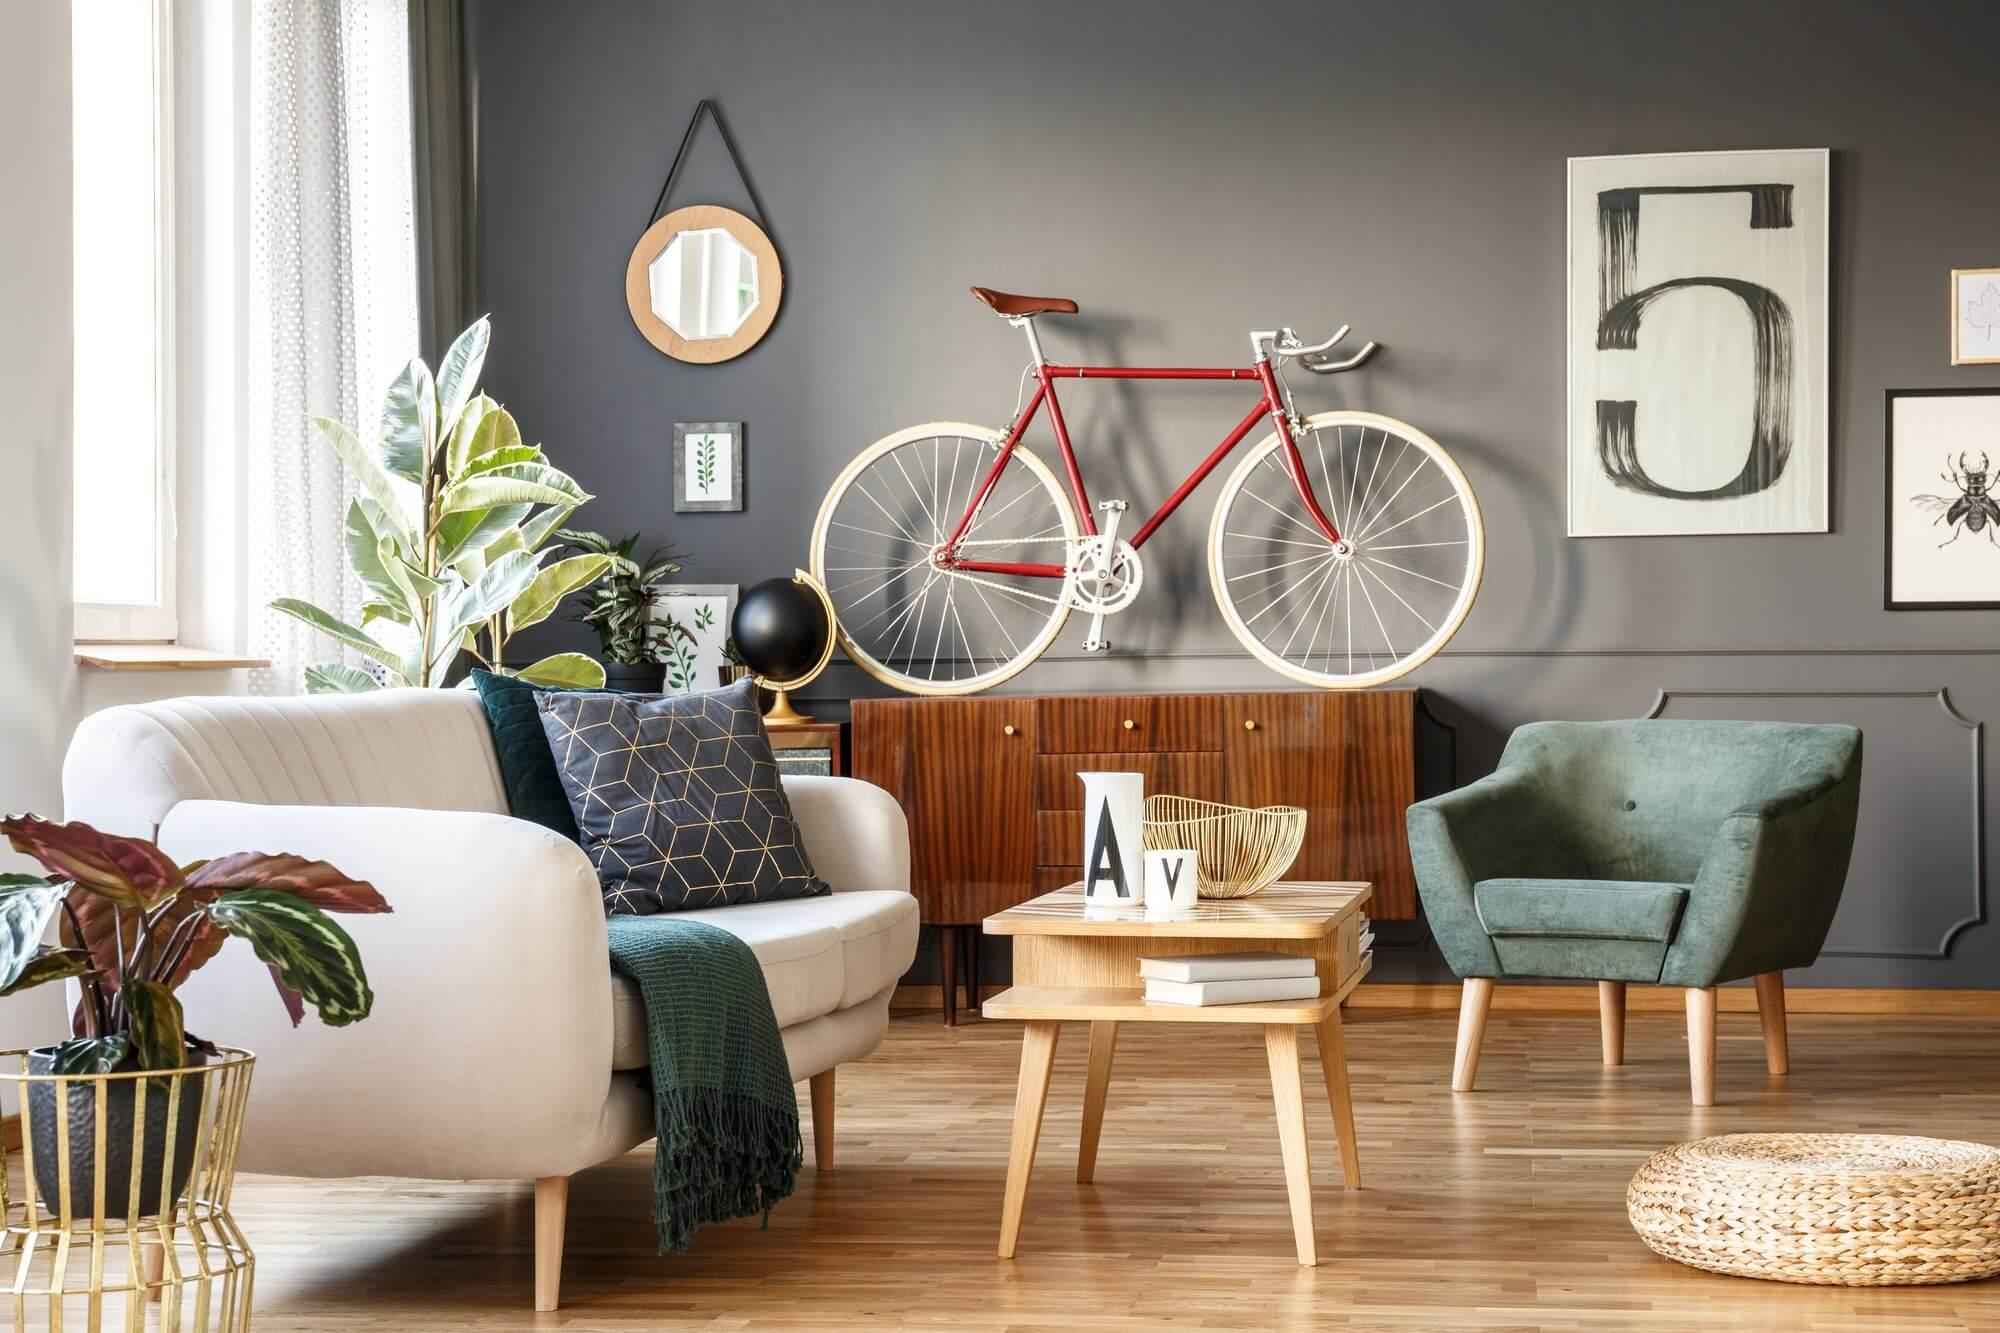 Bicycle as Decor - Living Room Decor